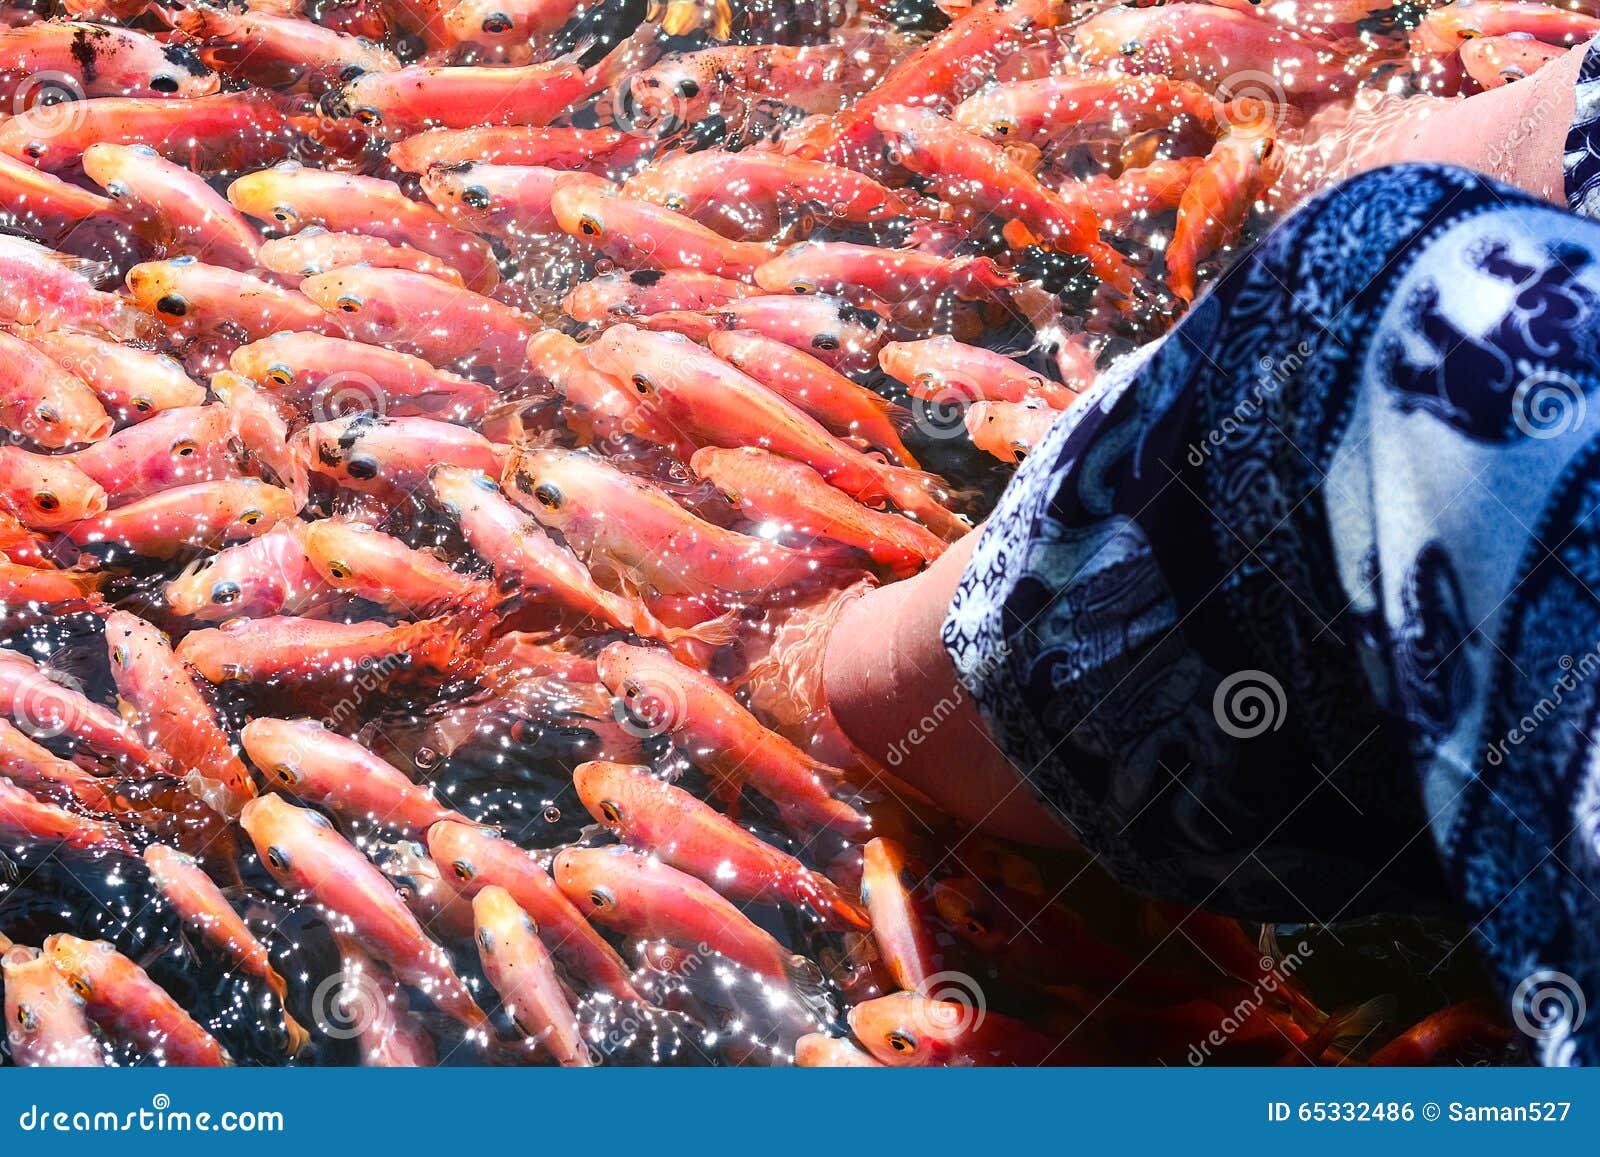 Fish aquarium in sri lanka - Fish Spa Therapy At Madu River In Sri Lanka